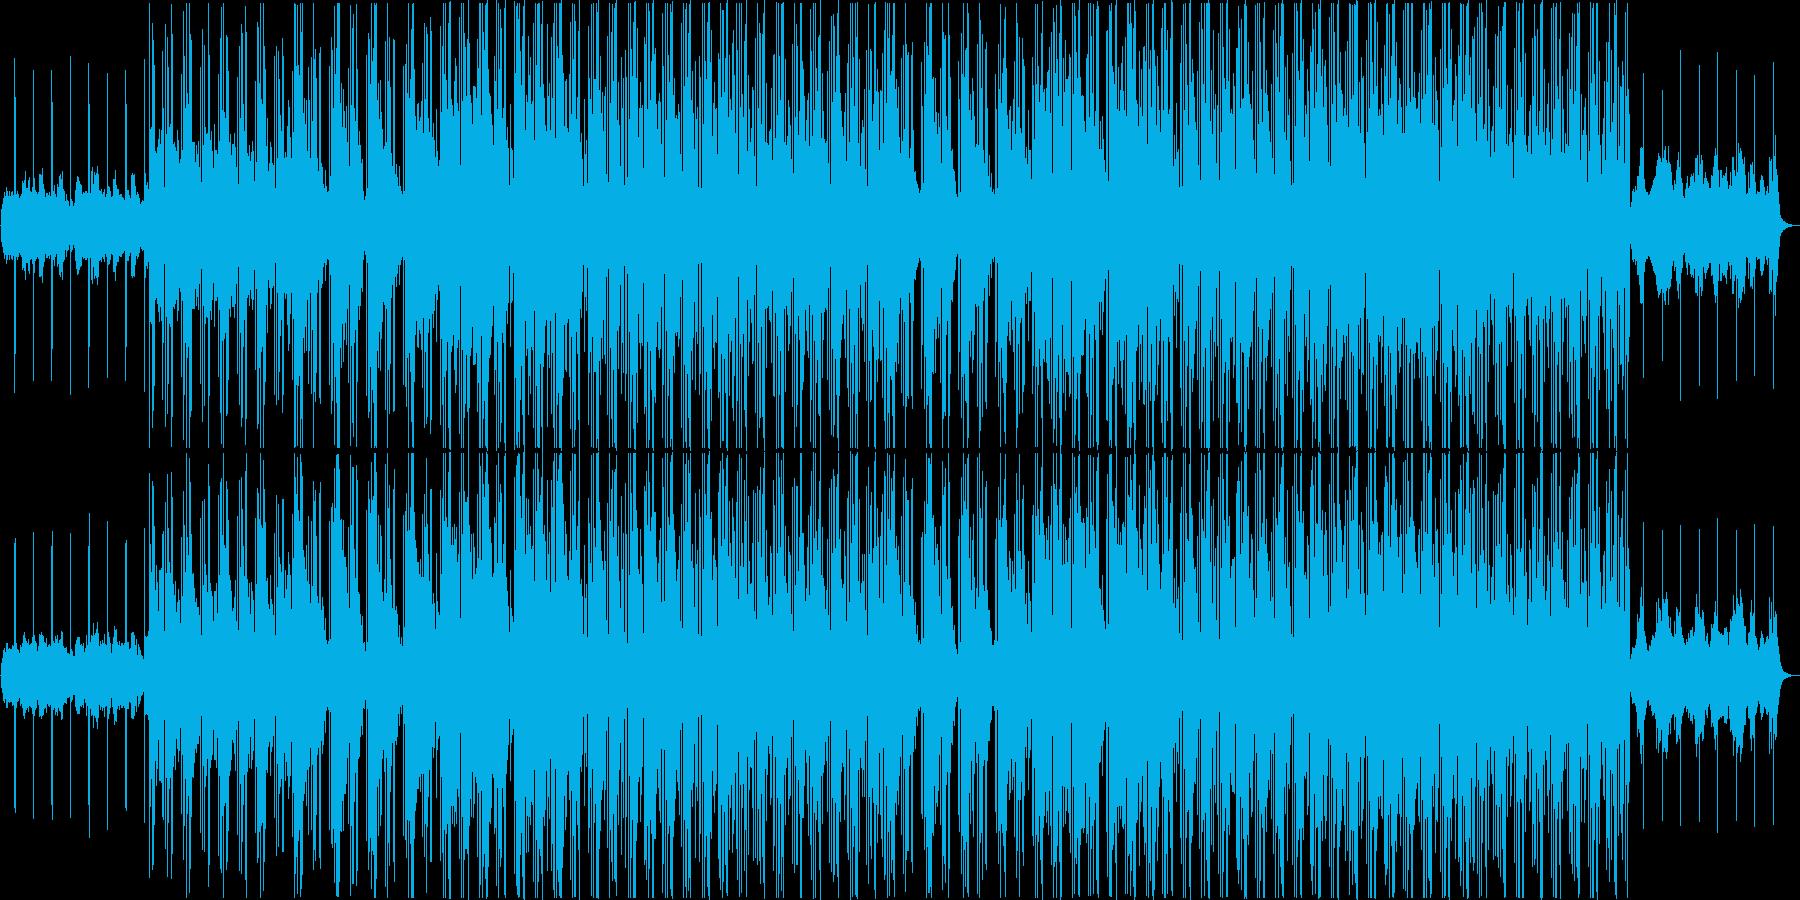 R&B英語/女性ボーカル/お洒落の再生済みの波形